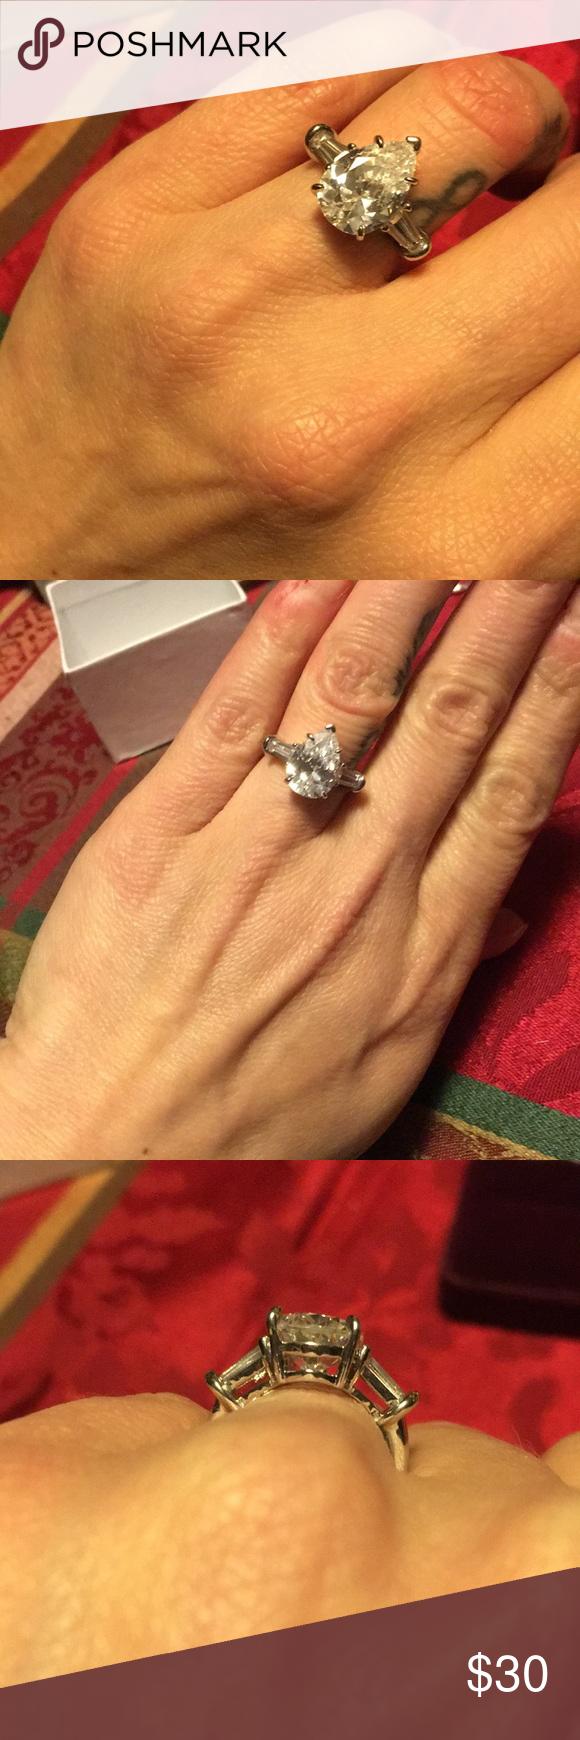 CZ 4ct pear shaped diamond ring Stunning pear shaped ring